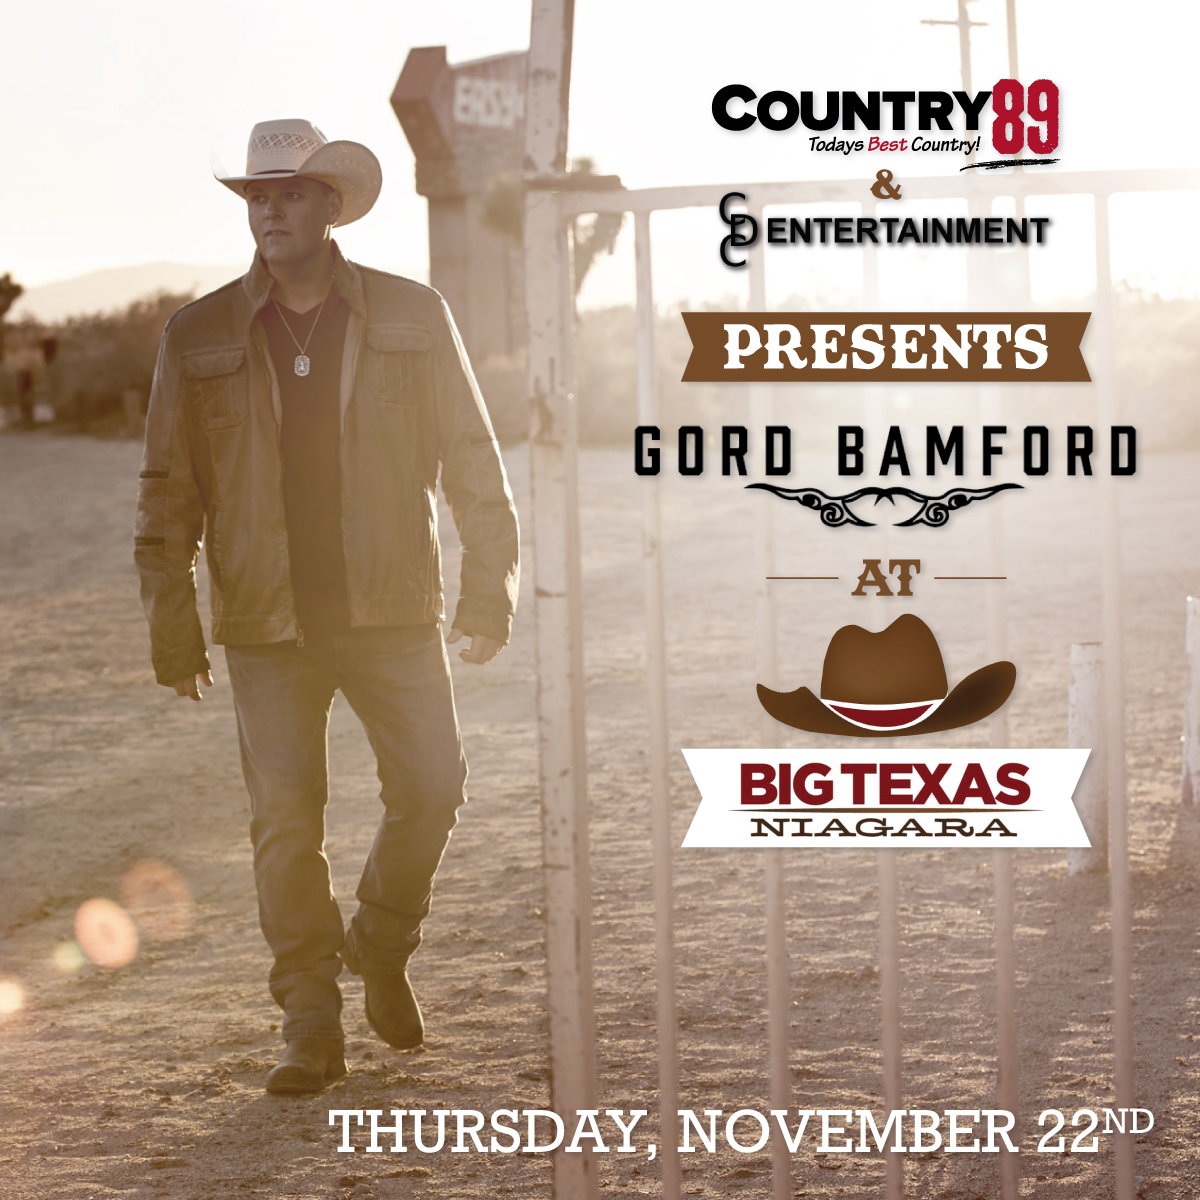 Country 89 Presents Gord Bamford at Big Texas – Win Ticket